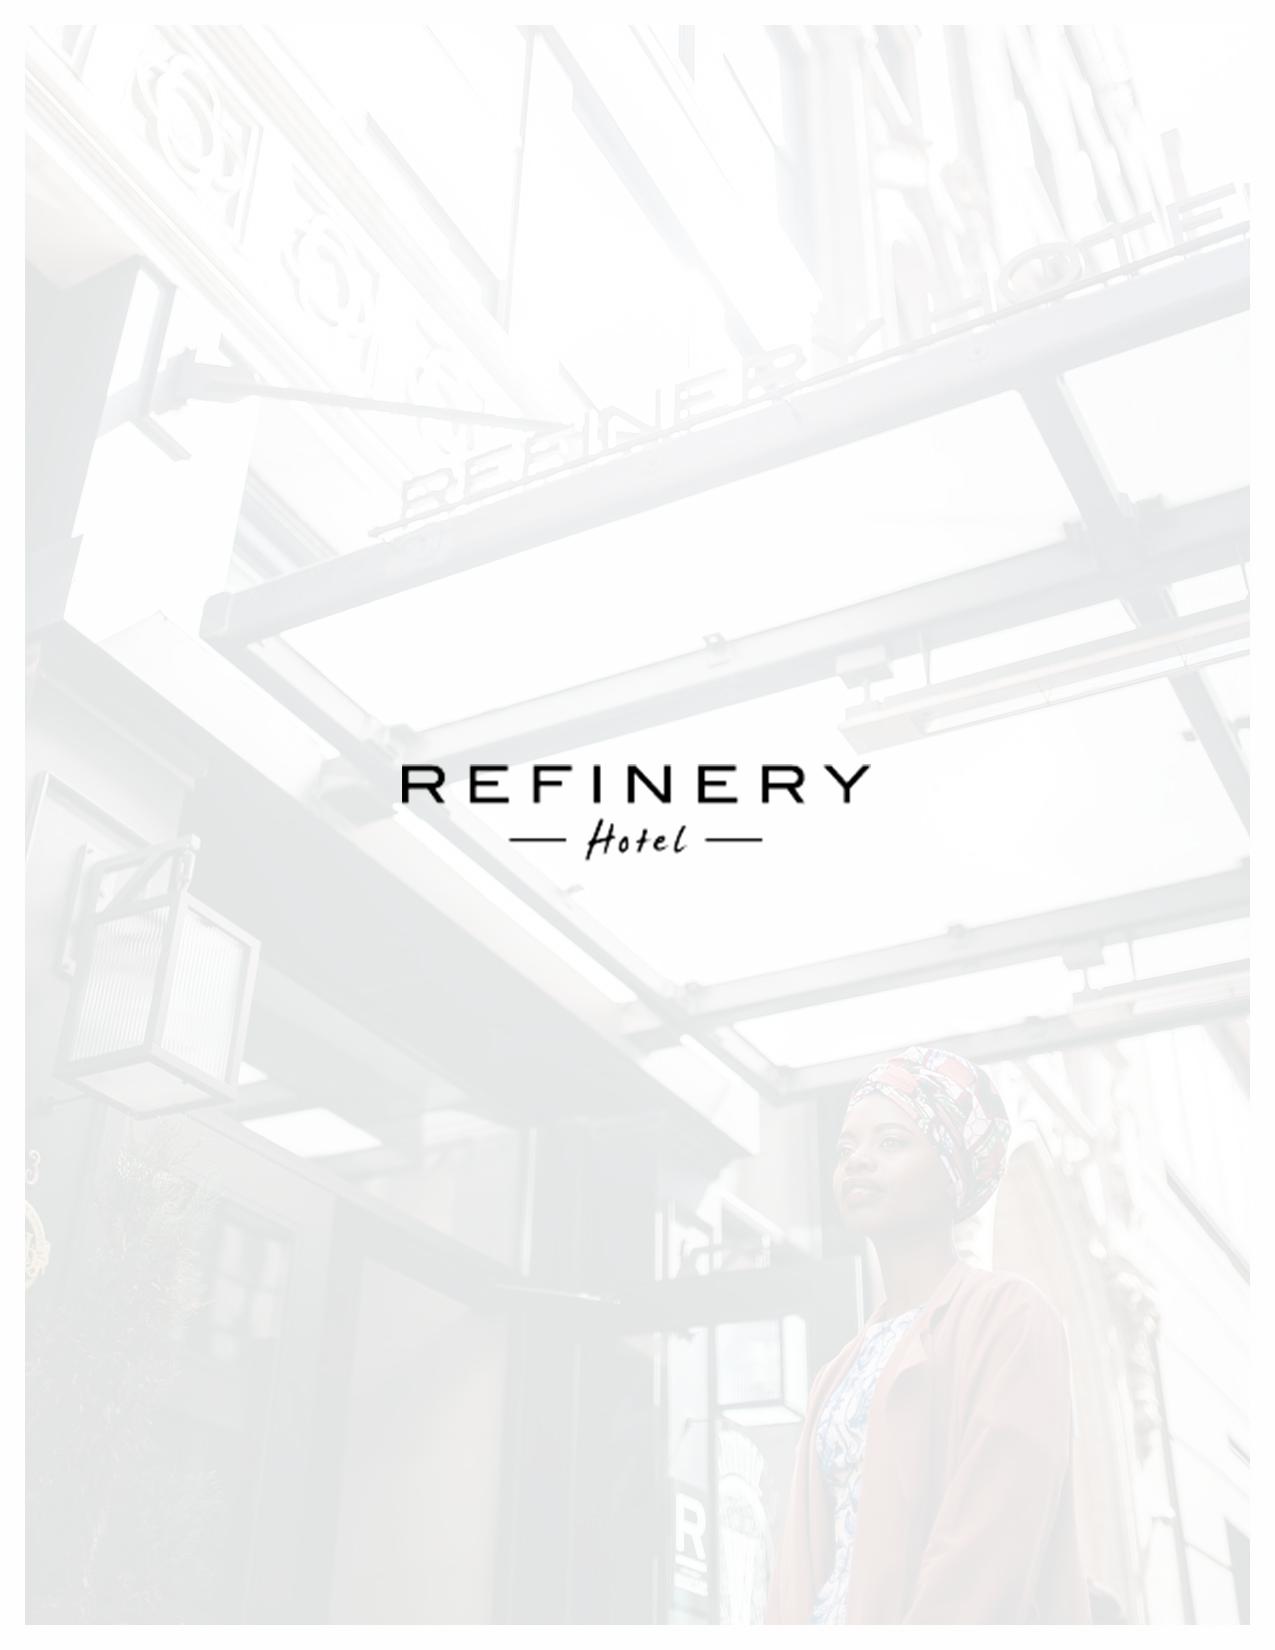 Refinery Hotel